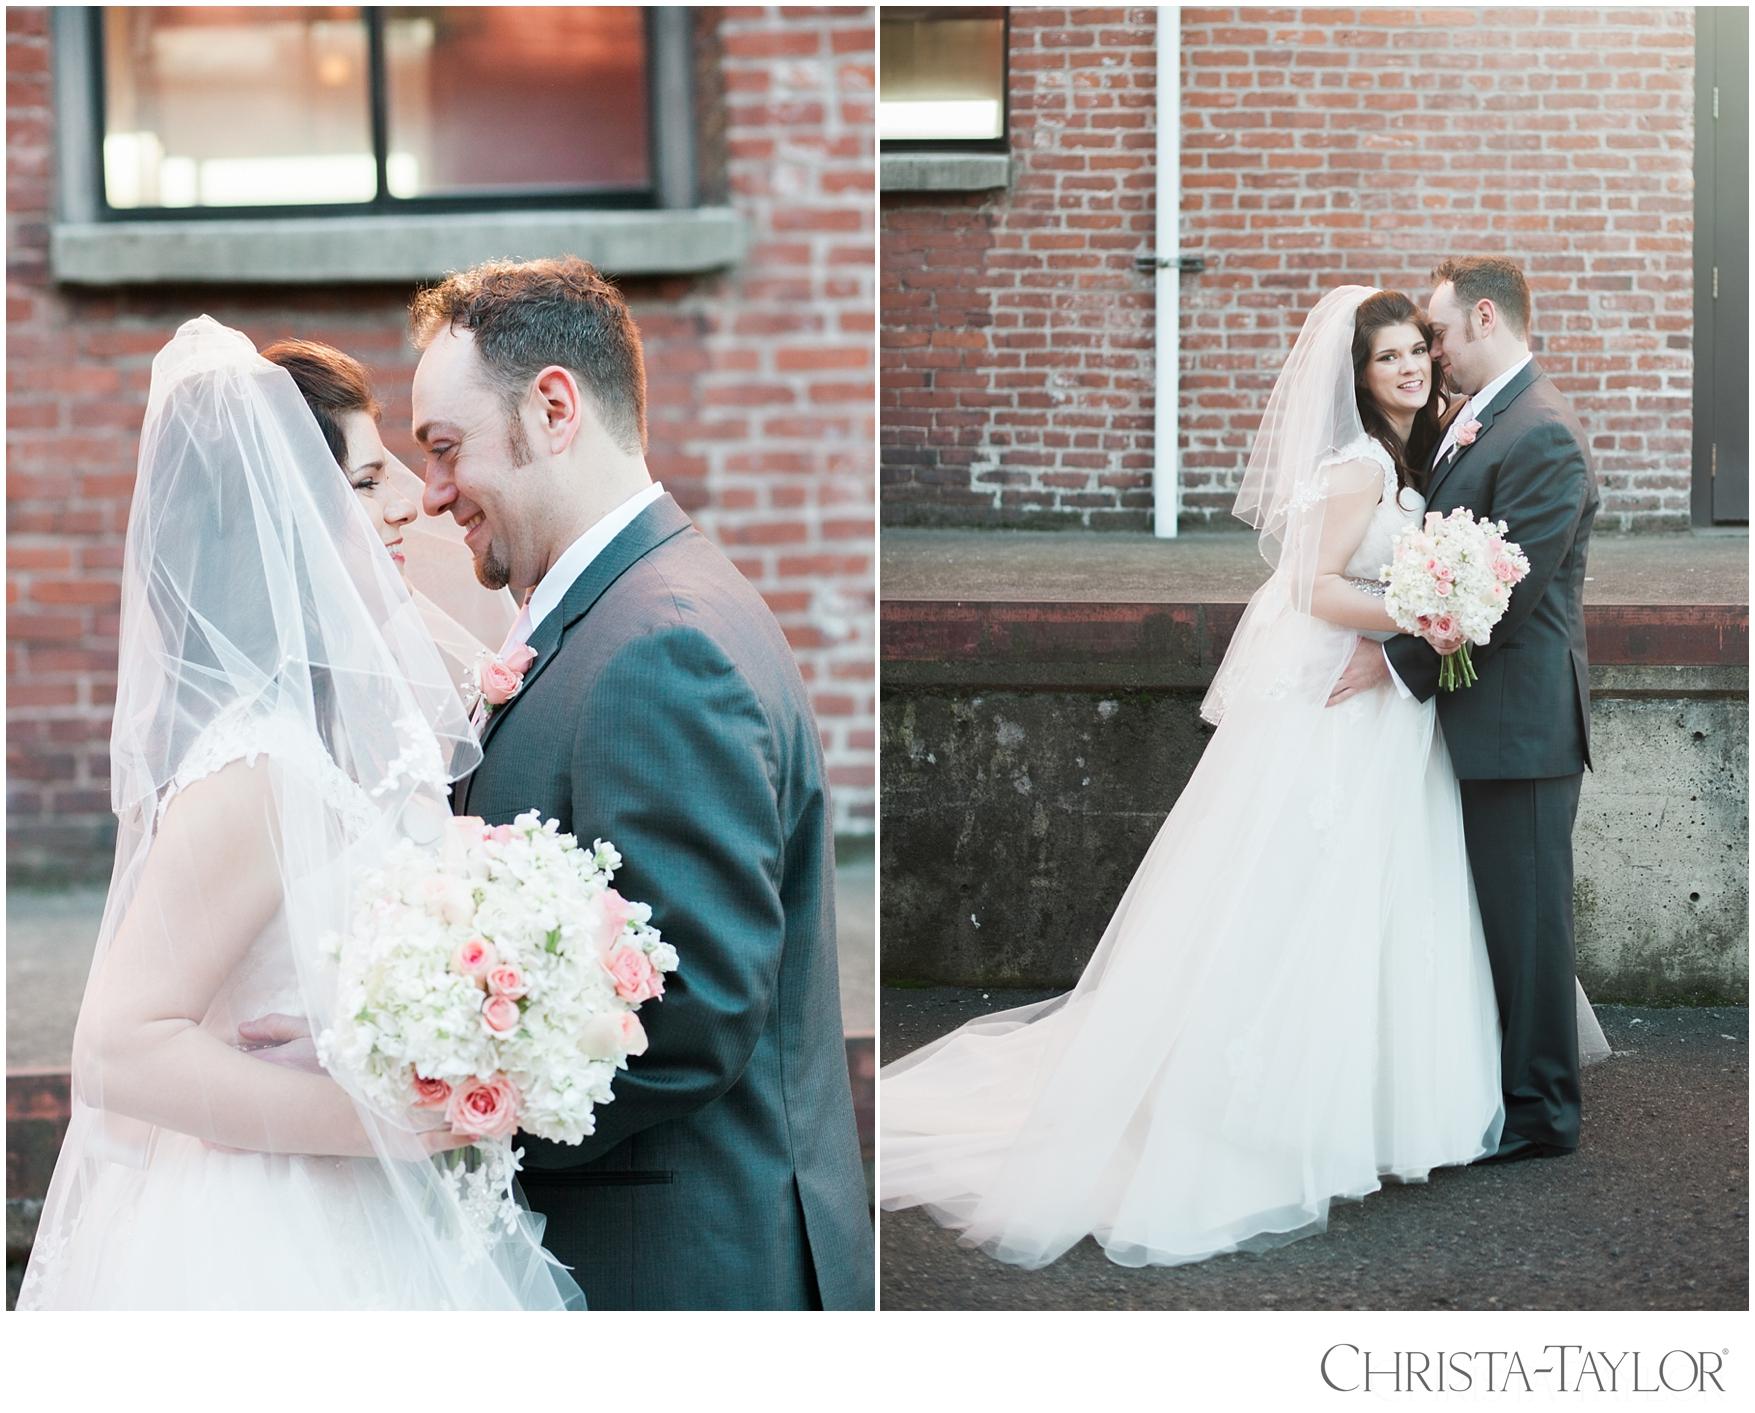 castaway portland wedding christa taylor_2263.jpg